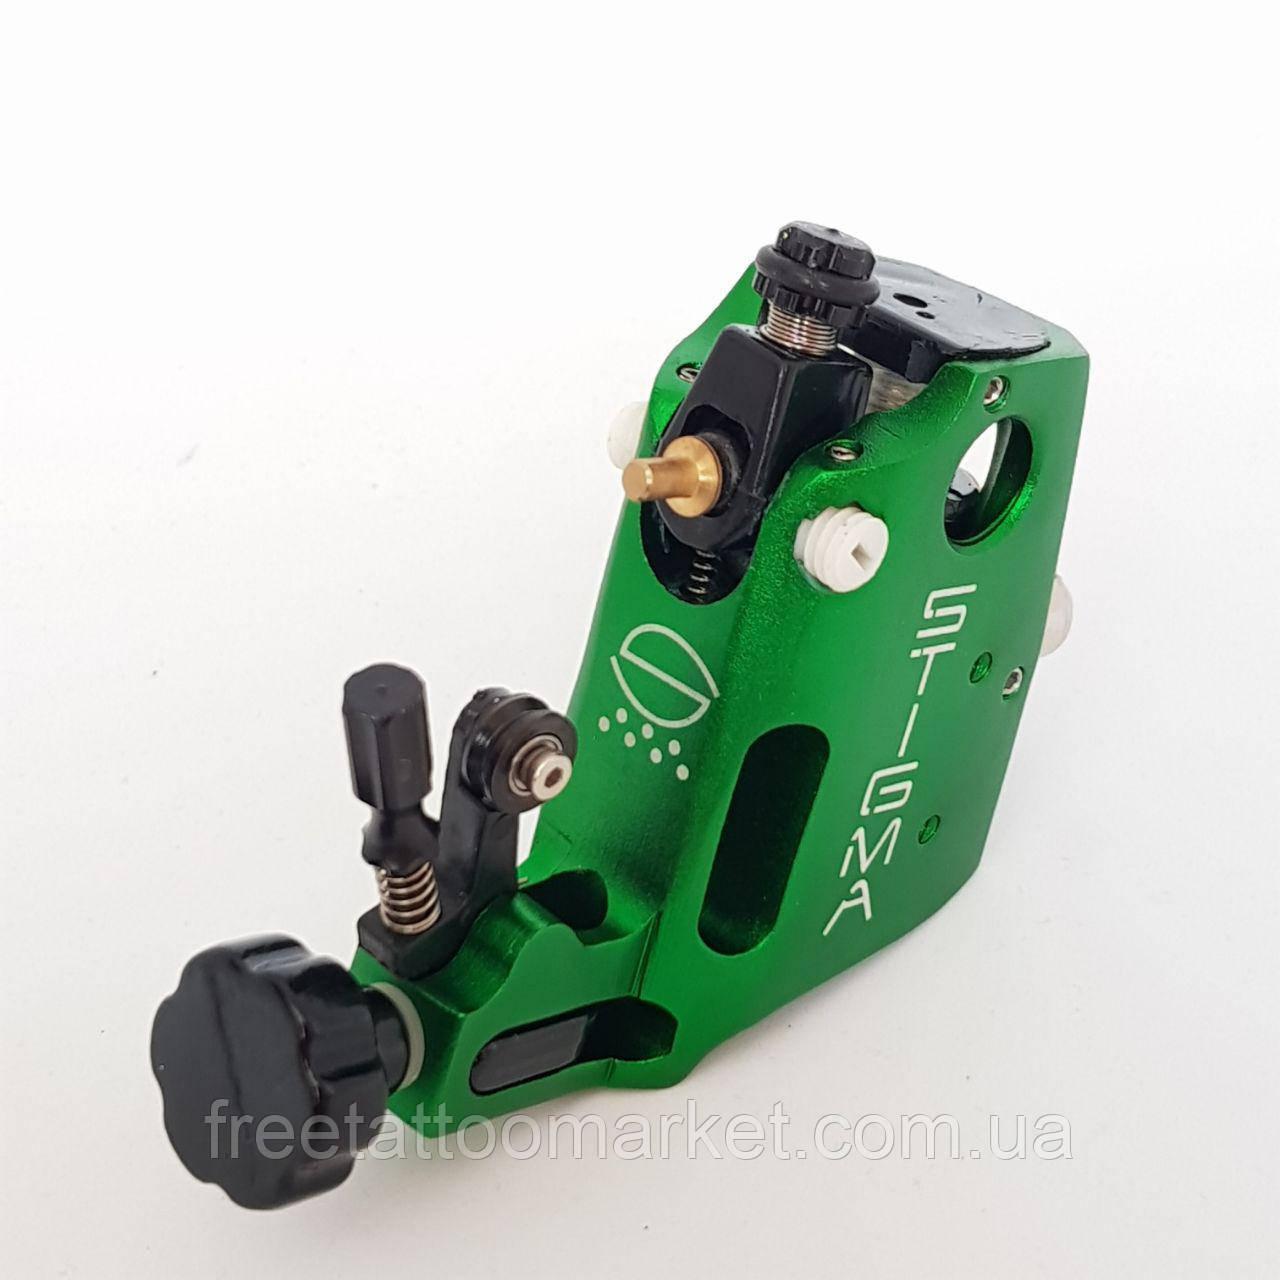 Роторная тату машинка Stigma Hyper V3